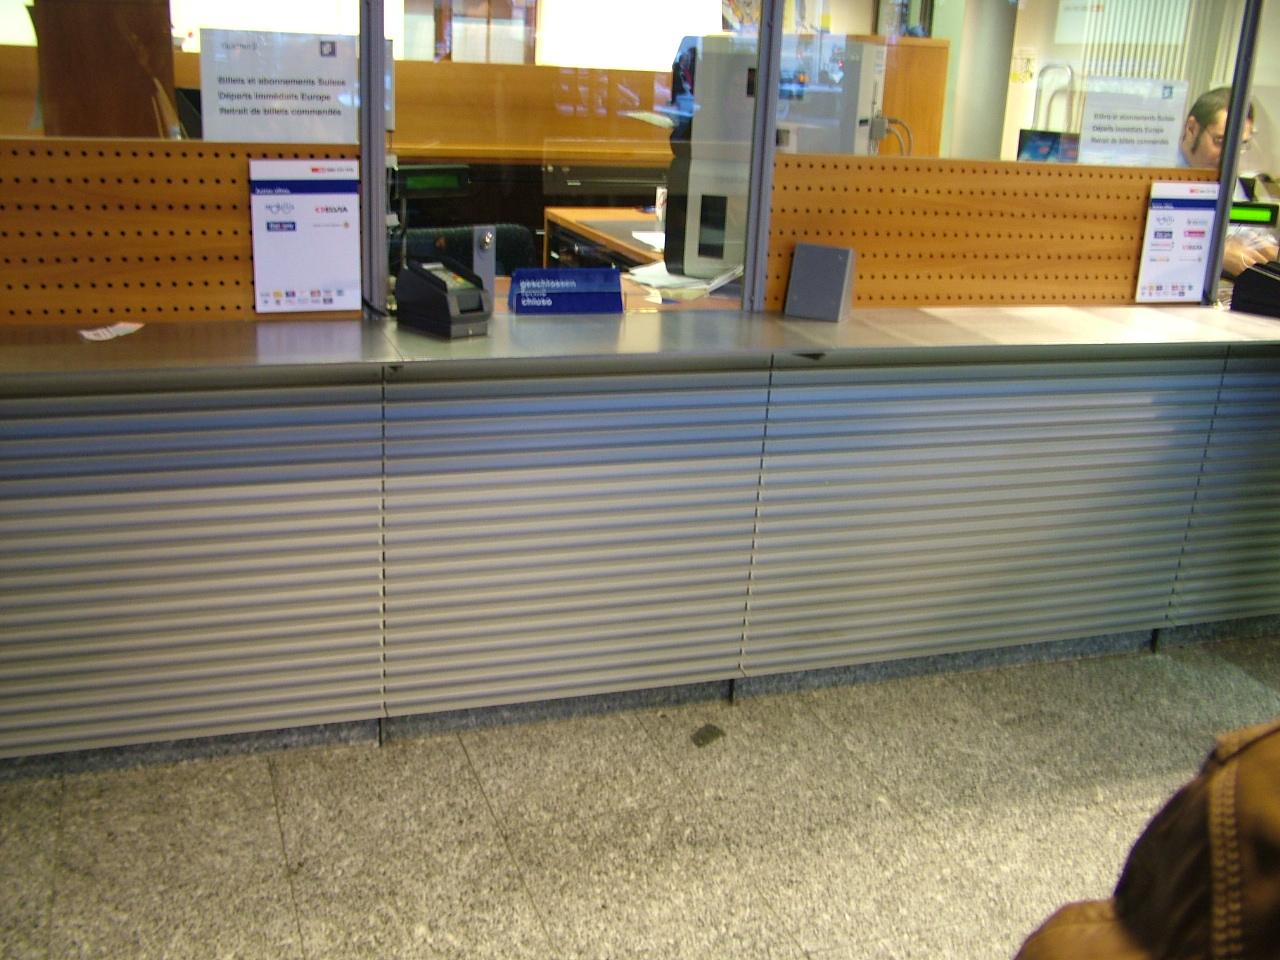 Station Lausanne